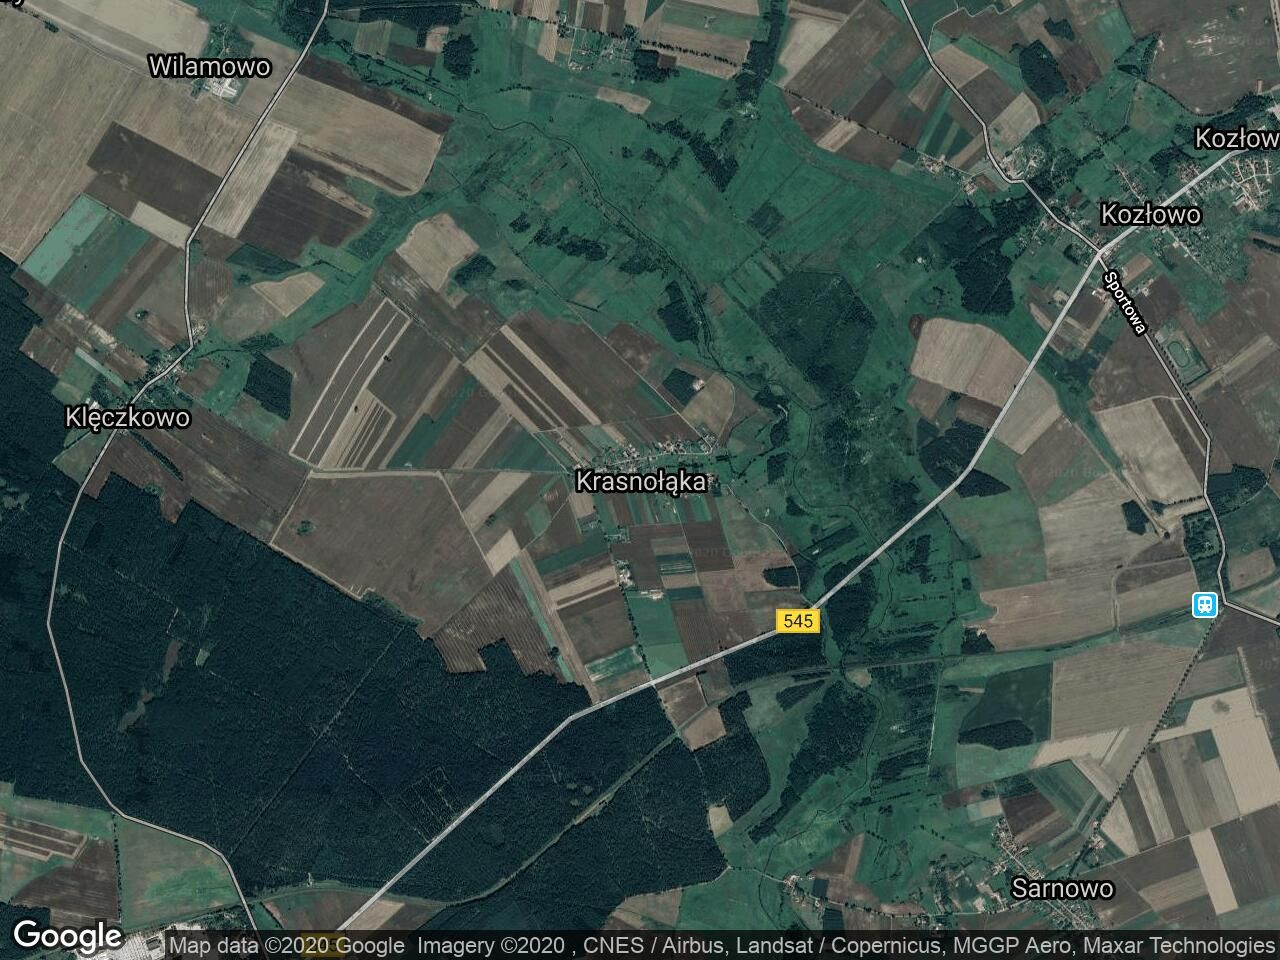 Działka rolna Krasnołąka